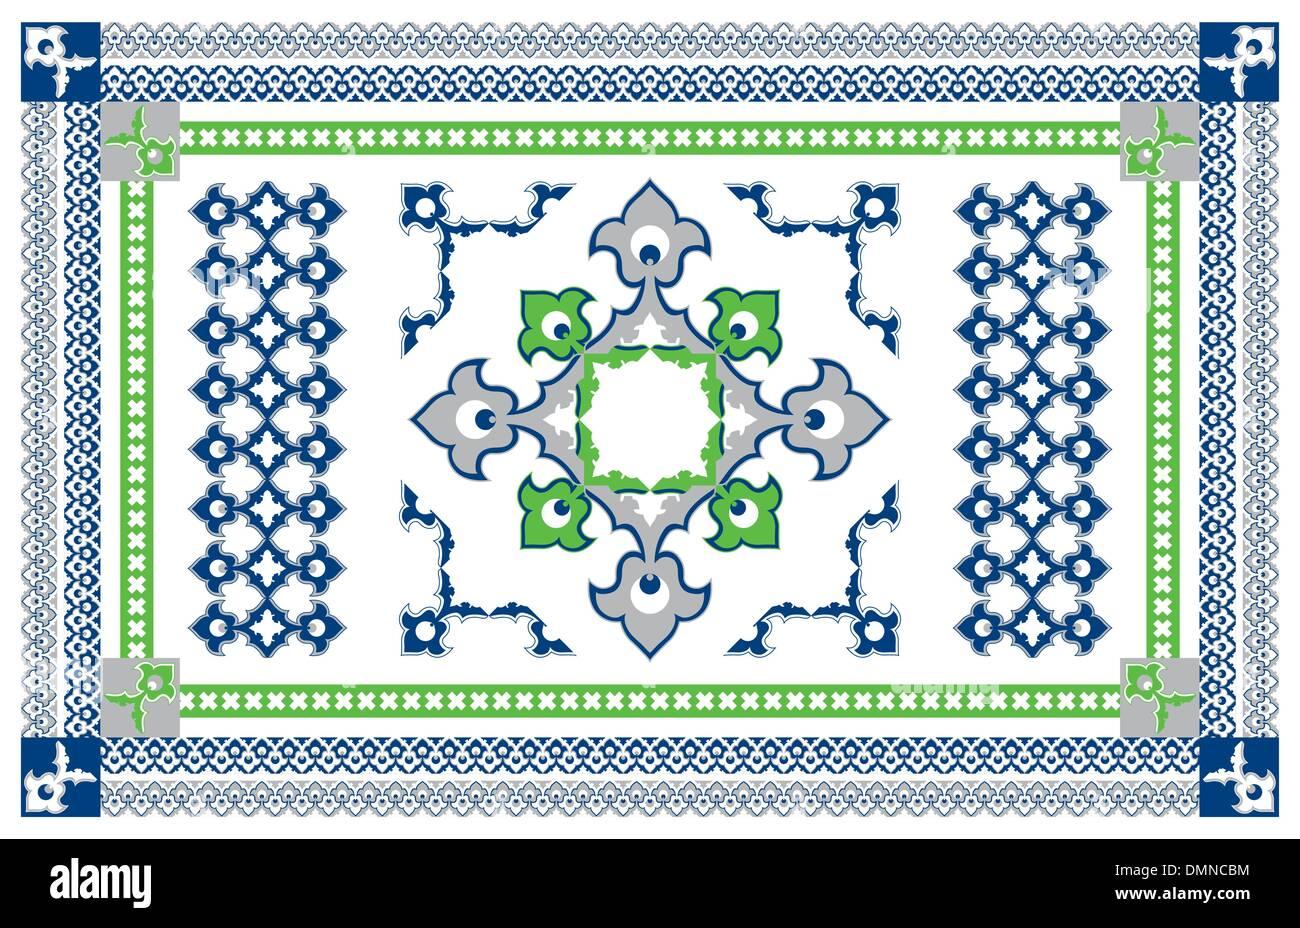 Arabic Style Carpet Design - Stock Vector